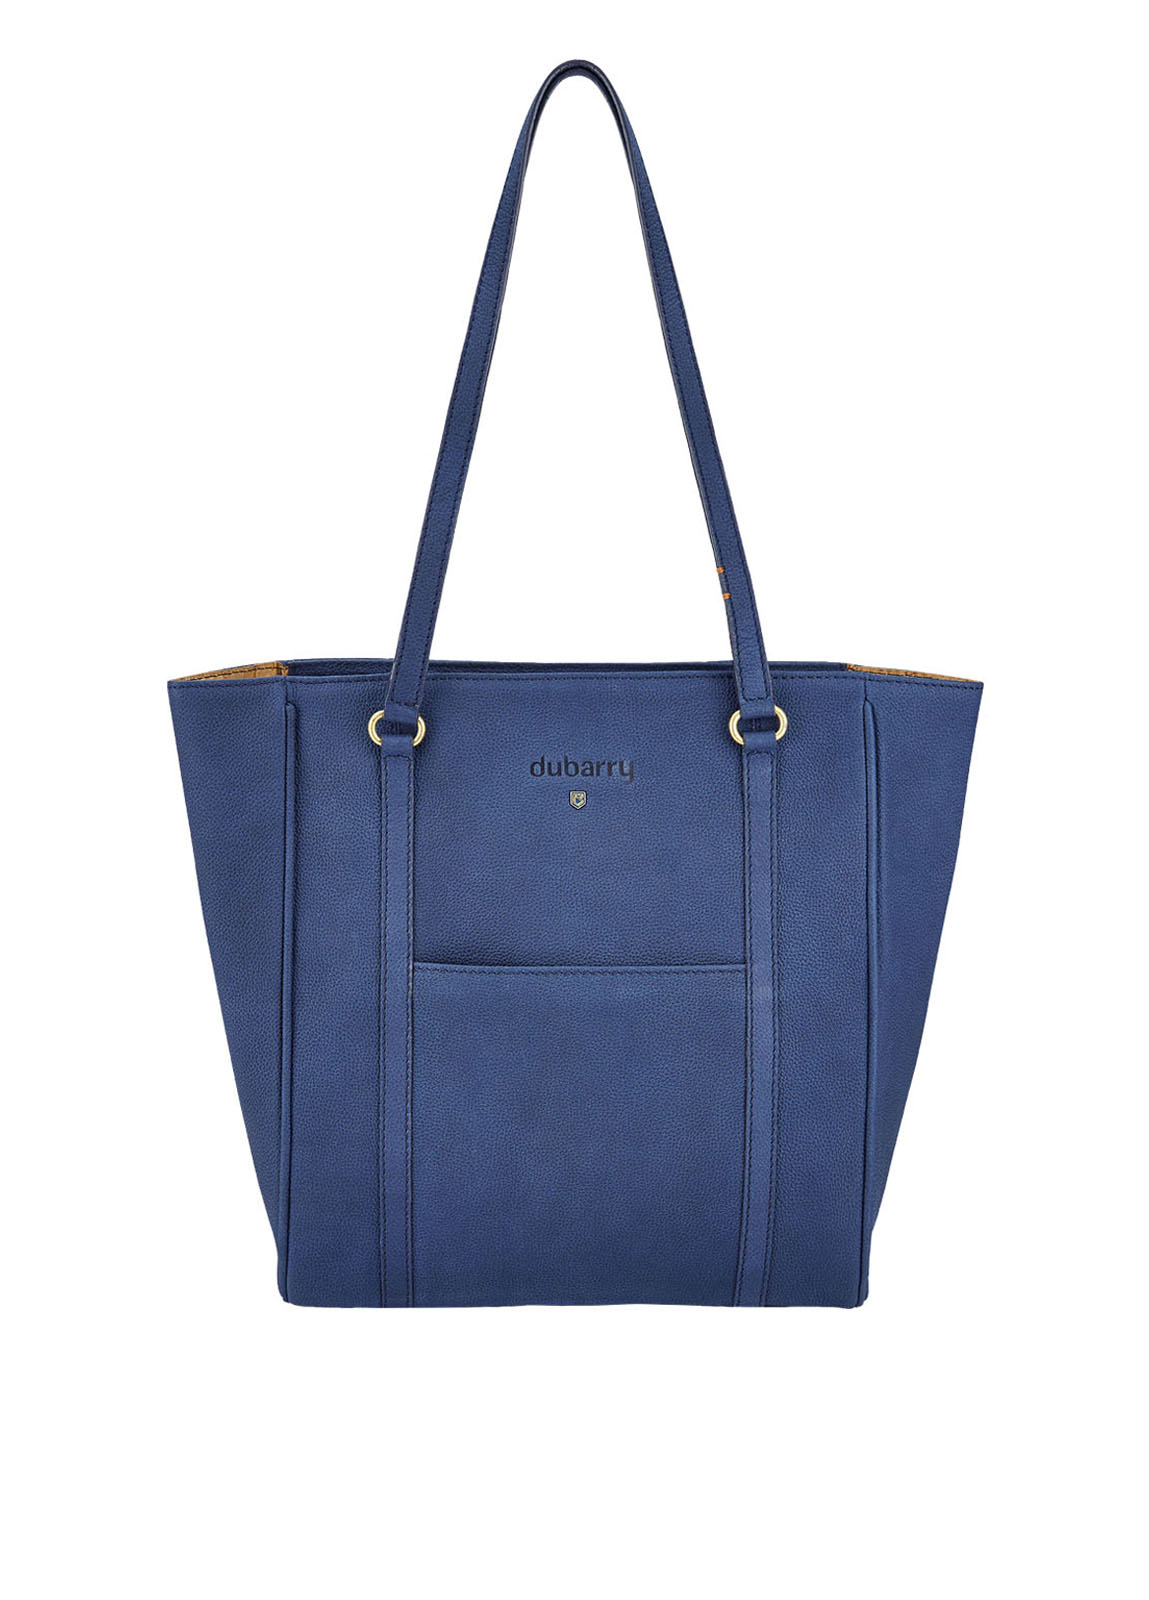 Arcadia_Tote_Bag_Royal_Blue_Image_1